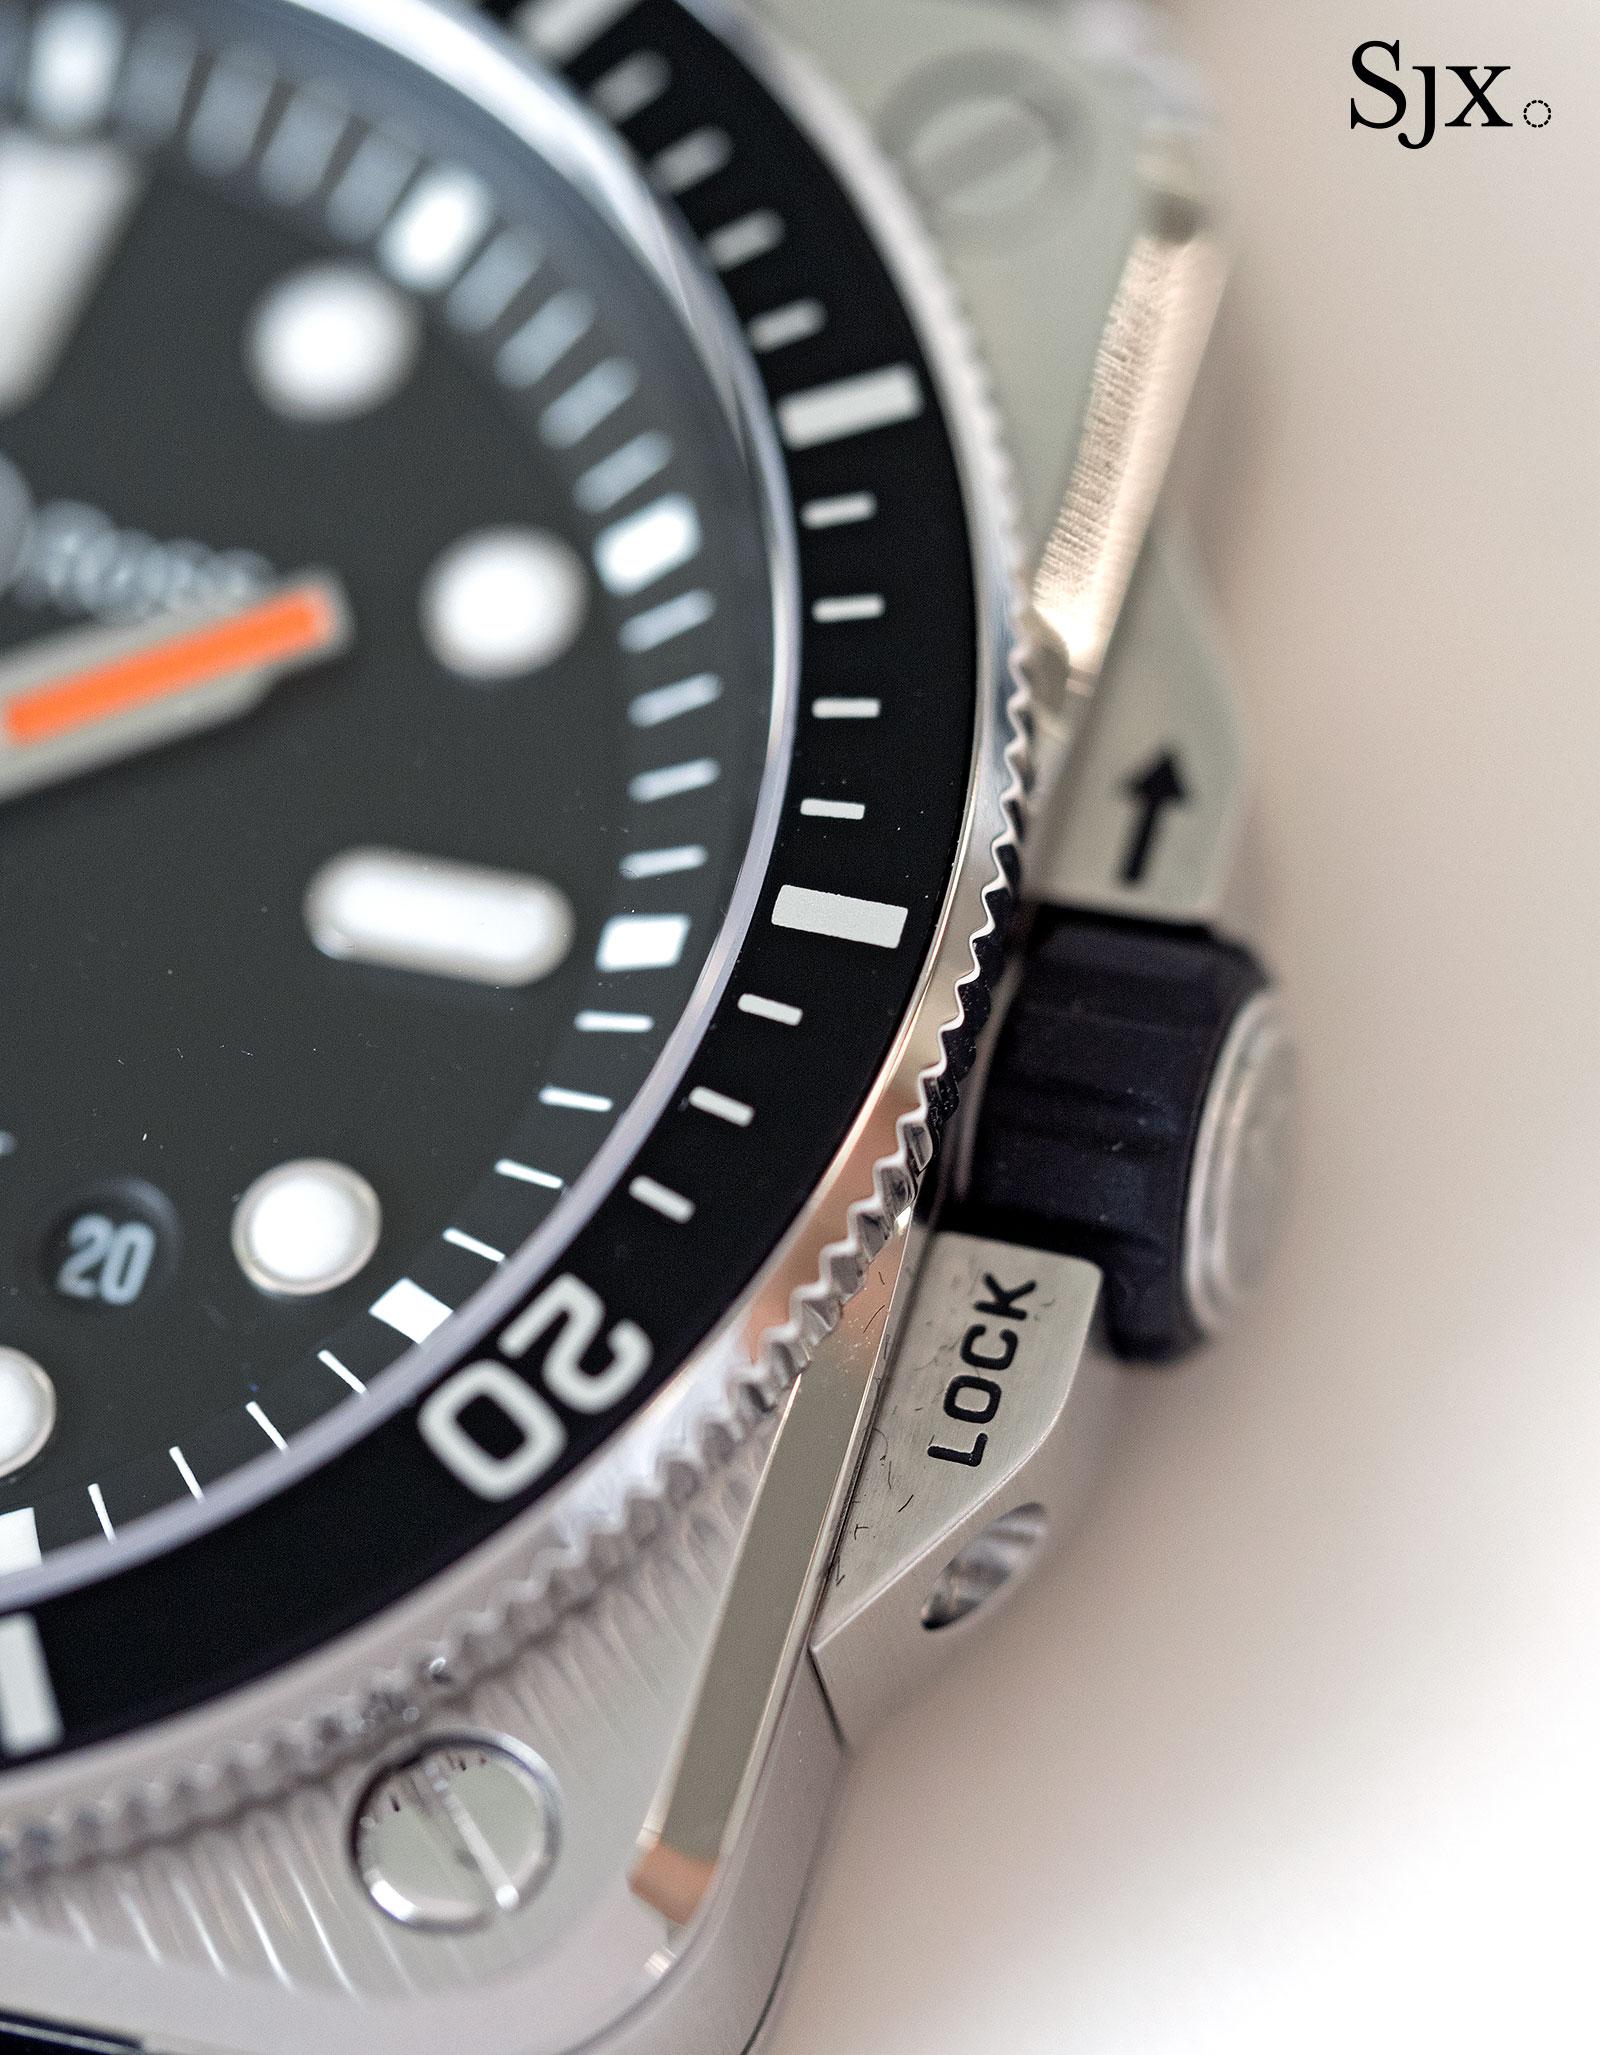 Bell & Ross BR 03-92 Diver 7